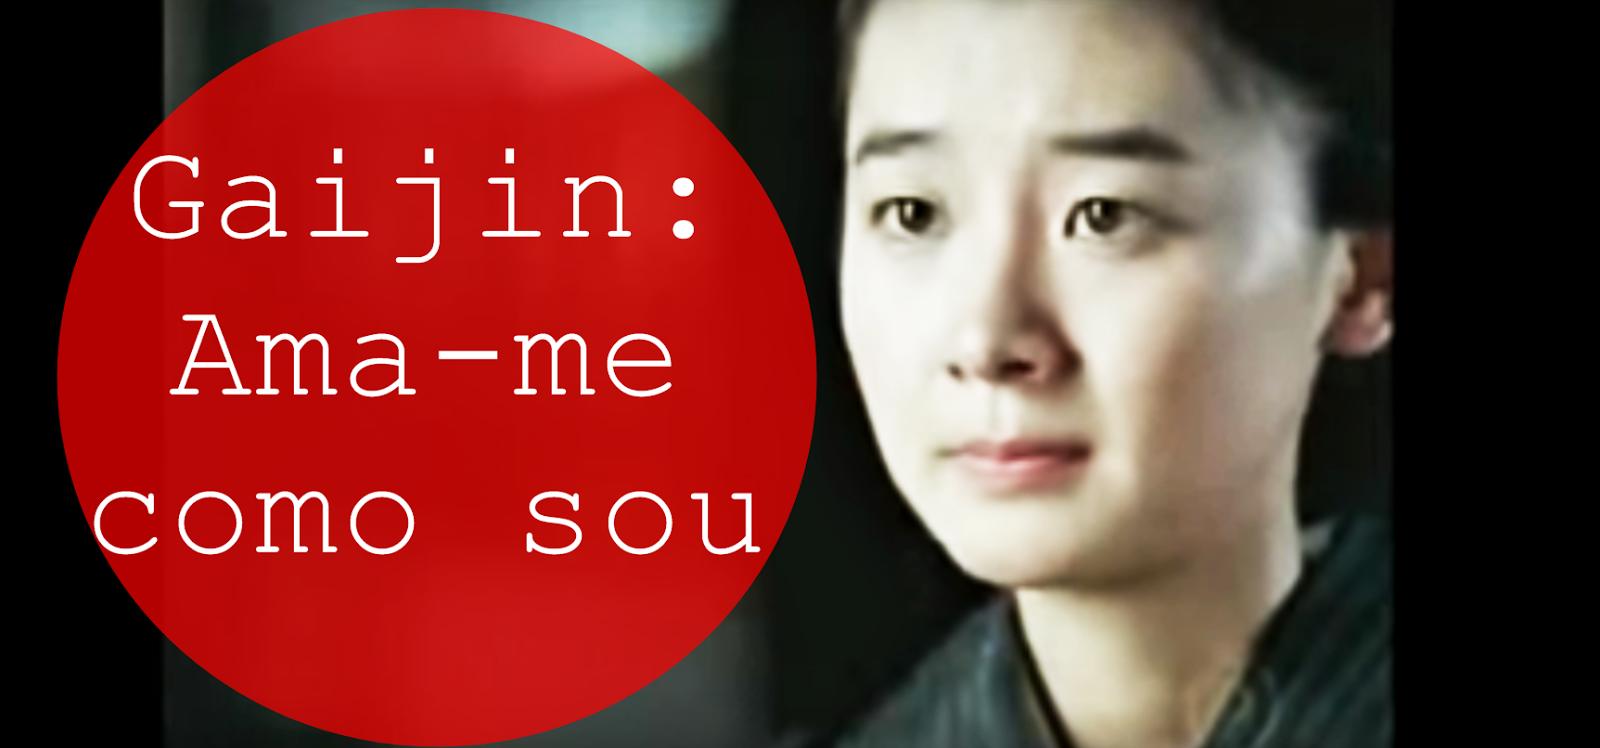 filme gaijin ama-me como sou